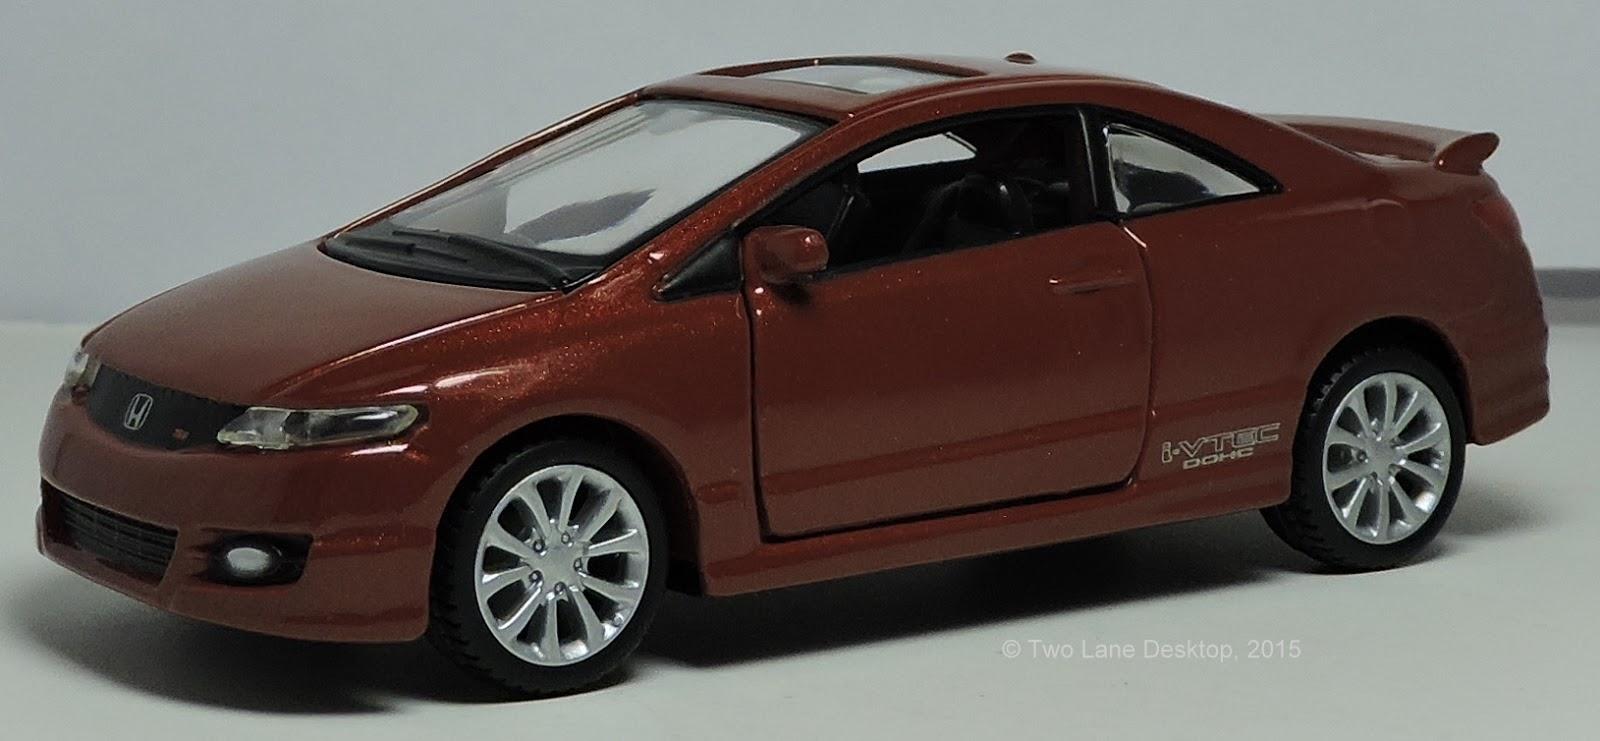 two lane desktop maisto 1 43 power racer 2010 honda civic si coupe. Black Bedroom Furniture Sets. Home Design Ideas